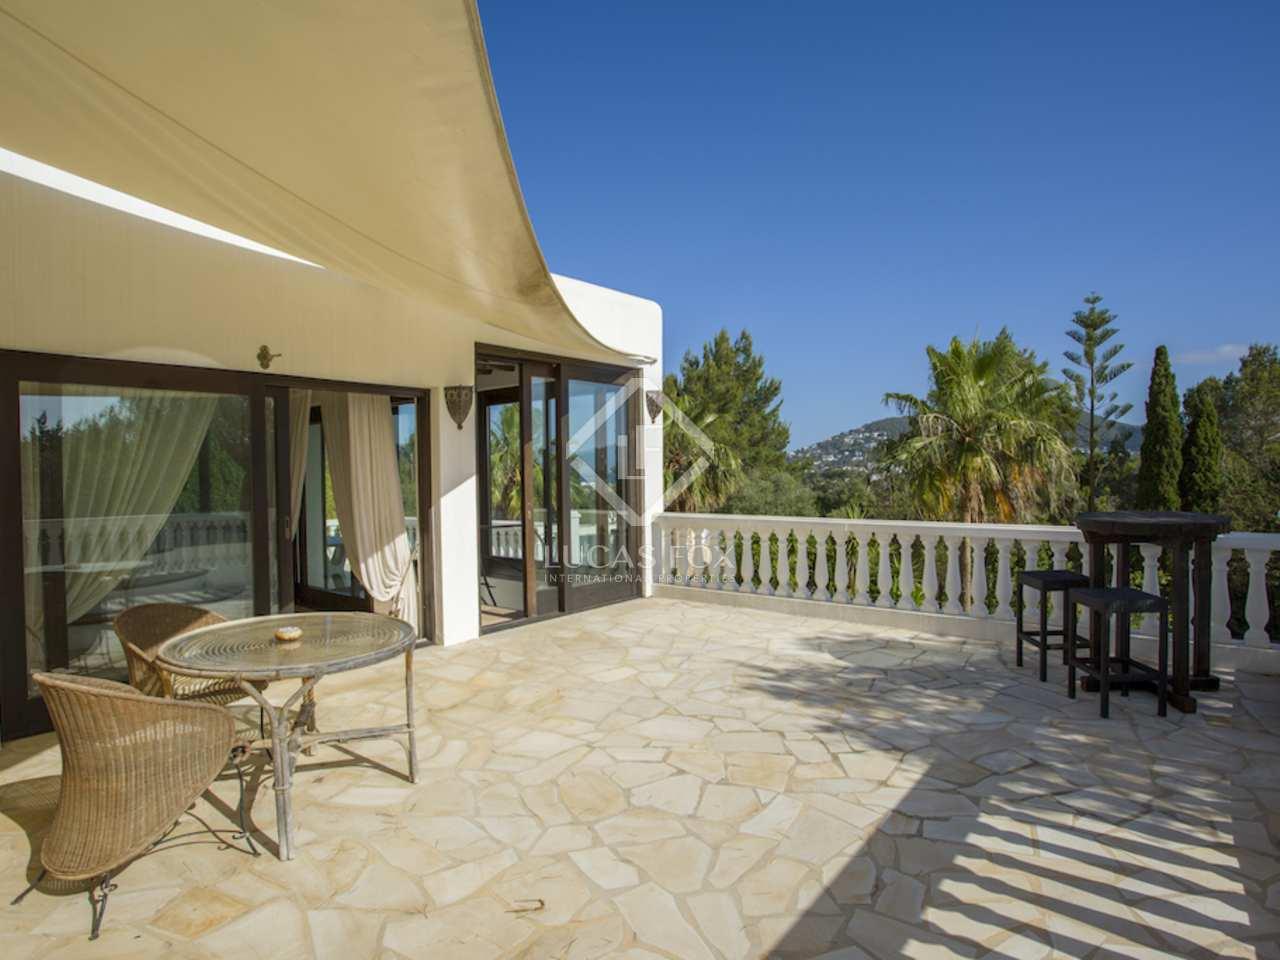 Casa renovada de 300m en venta en santa eulalia ibiza - Apartamentos santa eulalia ibiza ...